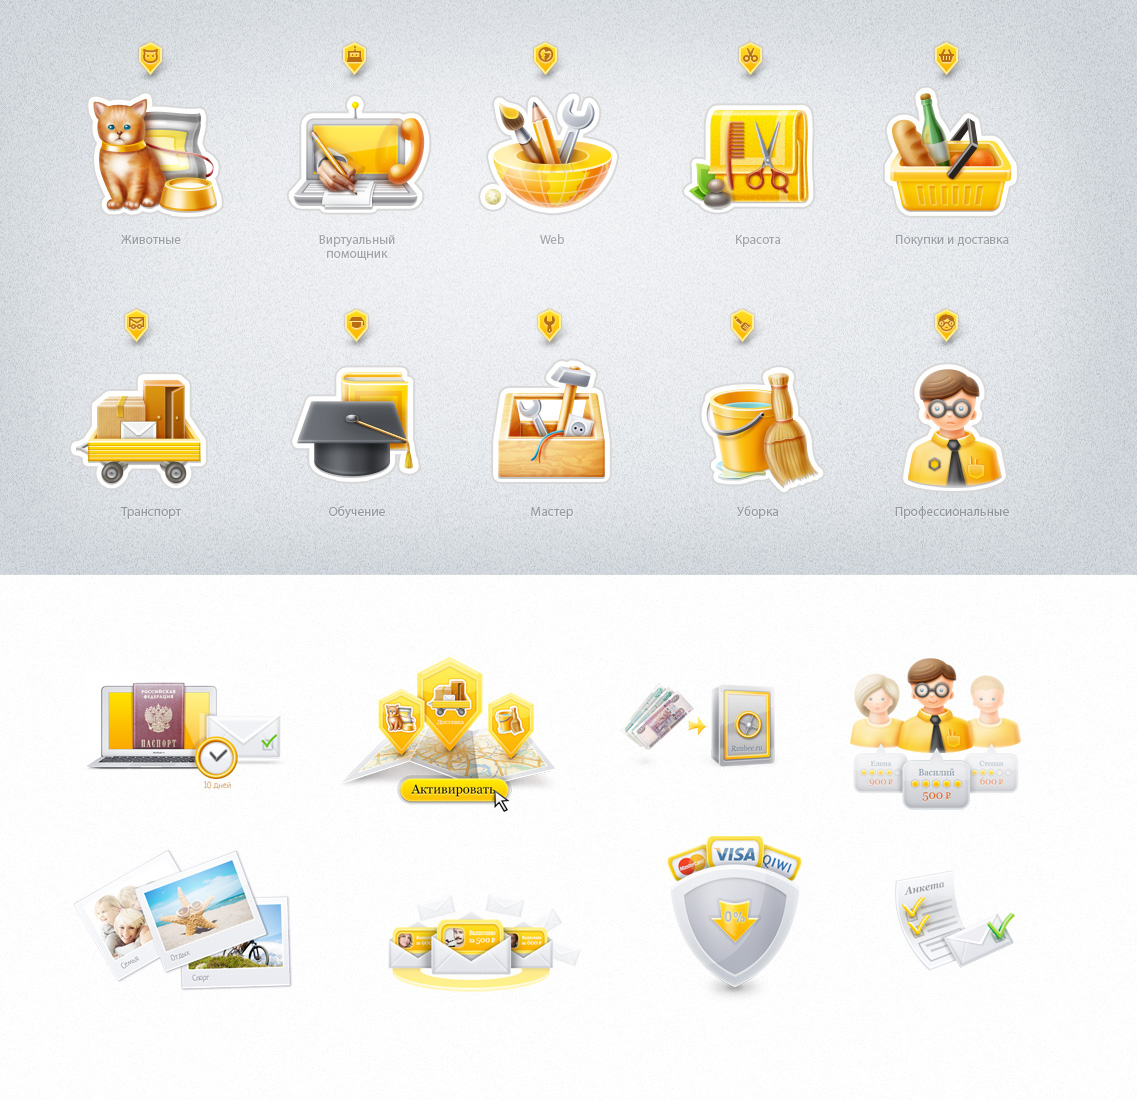 Иконки и тизеры для сервиса Runbee